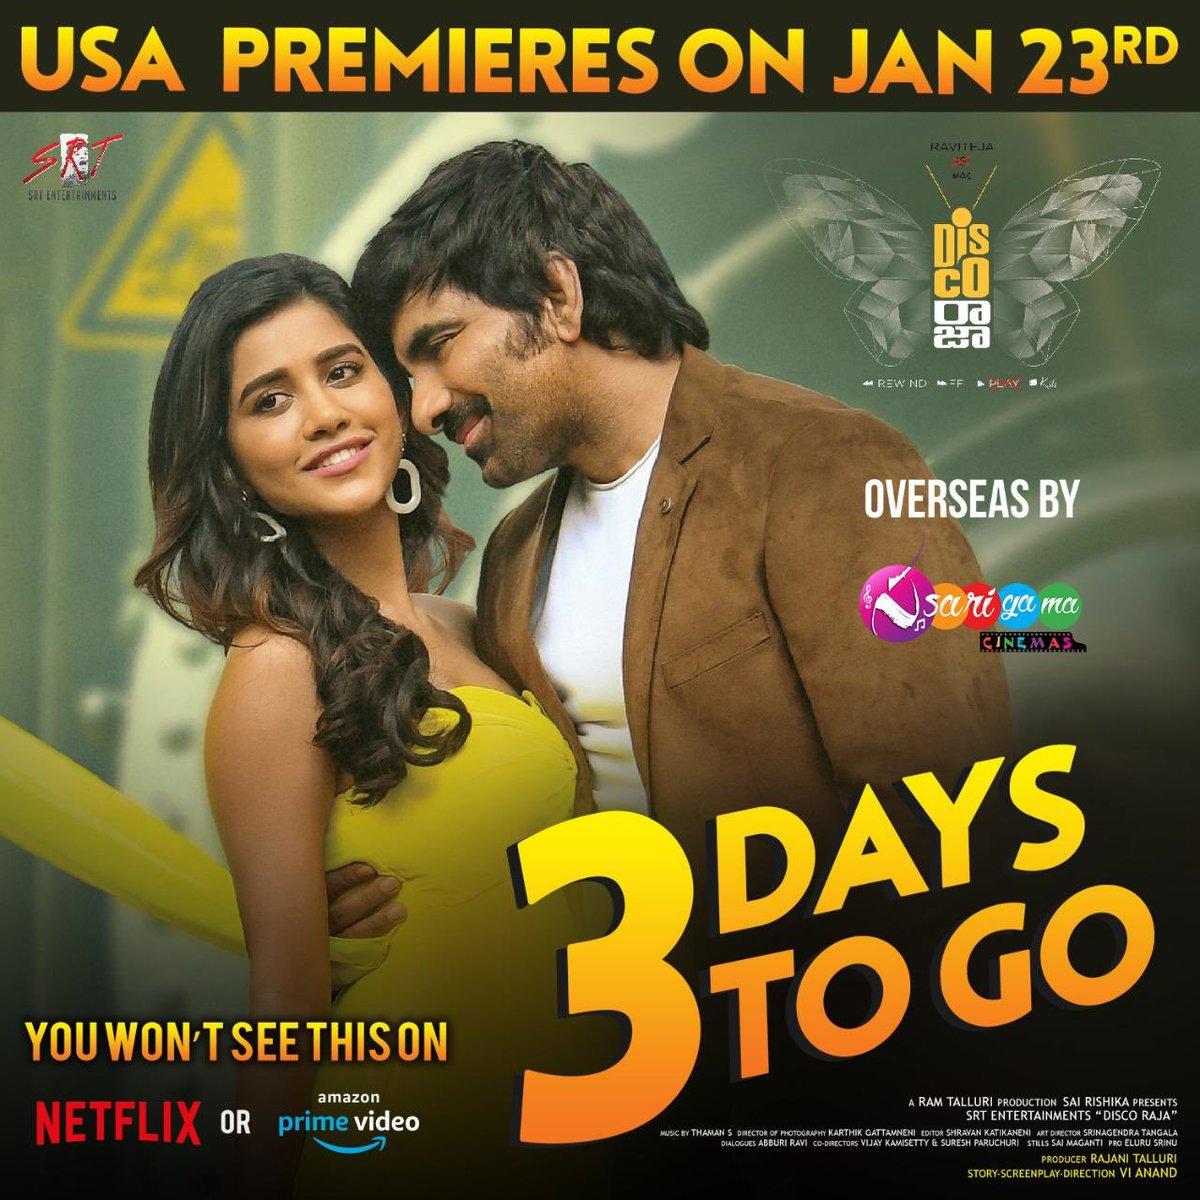 3 Days To Go For #DiscoRaja Premieres..  #USA  Premieres on Jan 23rd..  Biggest Release for @RaviTeja_offl   Overseas Release by @sarigamacinemas   #raviteja @NabhaNatesh @starlingpayal #NabhaNatesh #PayalRajput pic.twitter.com/N4MCffFmdL